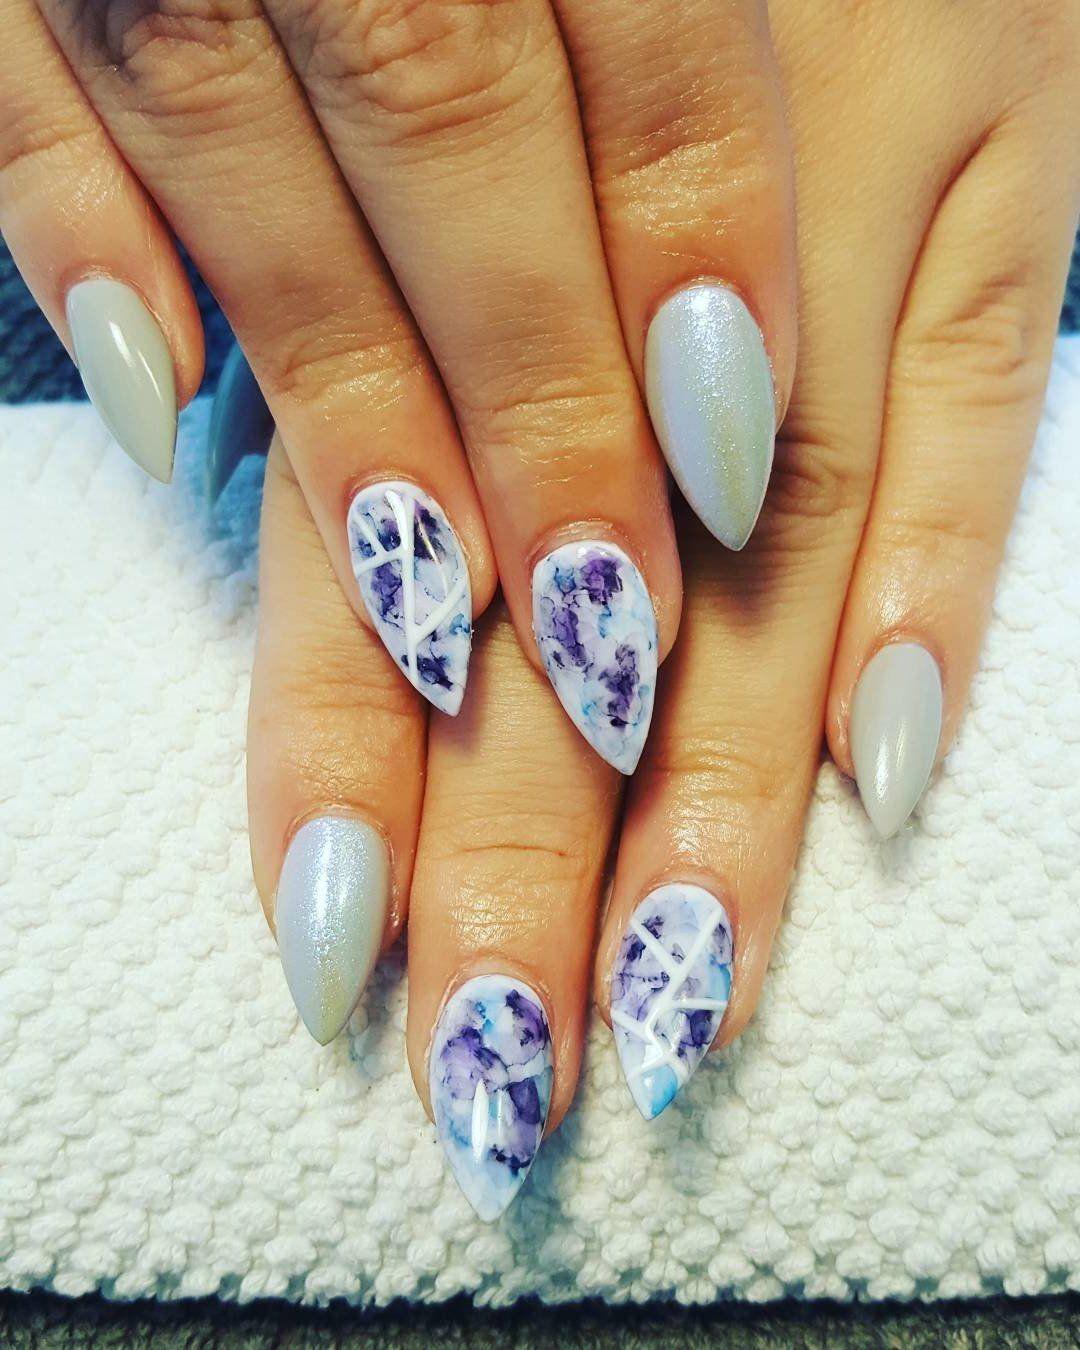 Acryl Nägel - clevere Lösung für brüchige Nägel - Nageldesign   Manicure